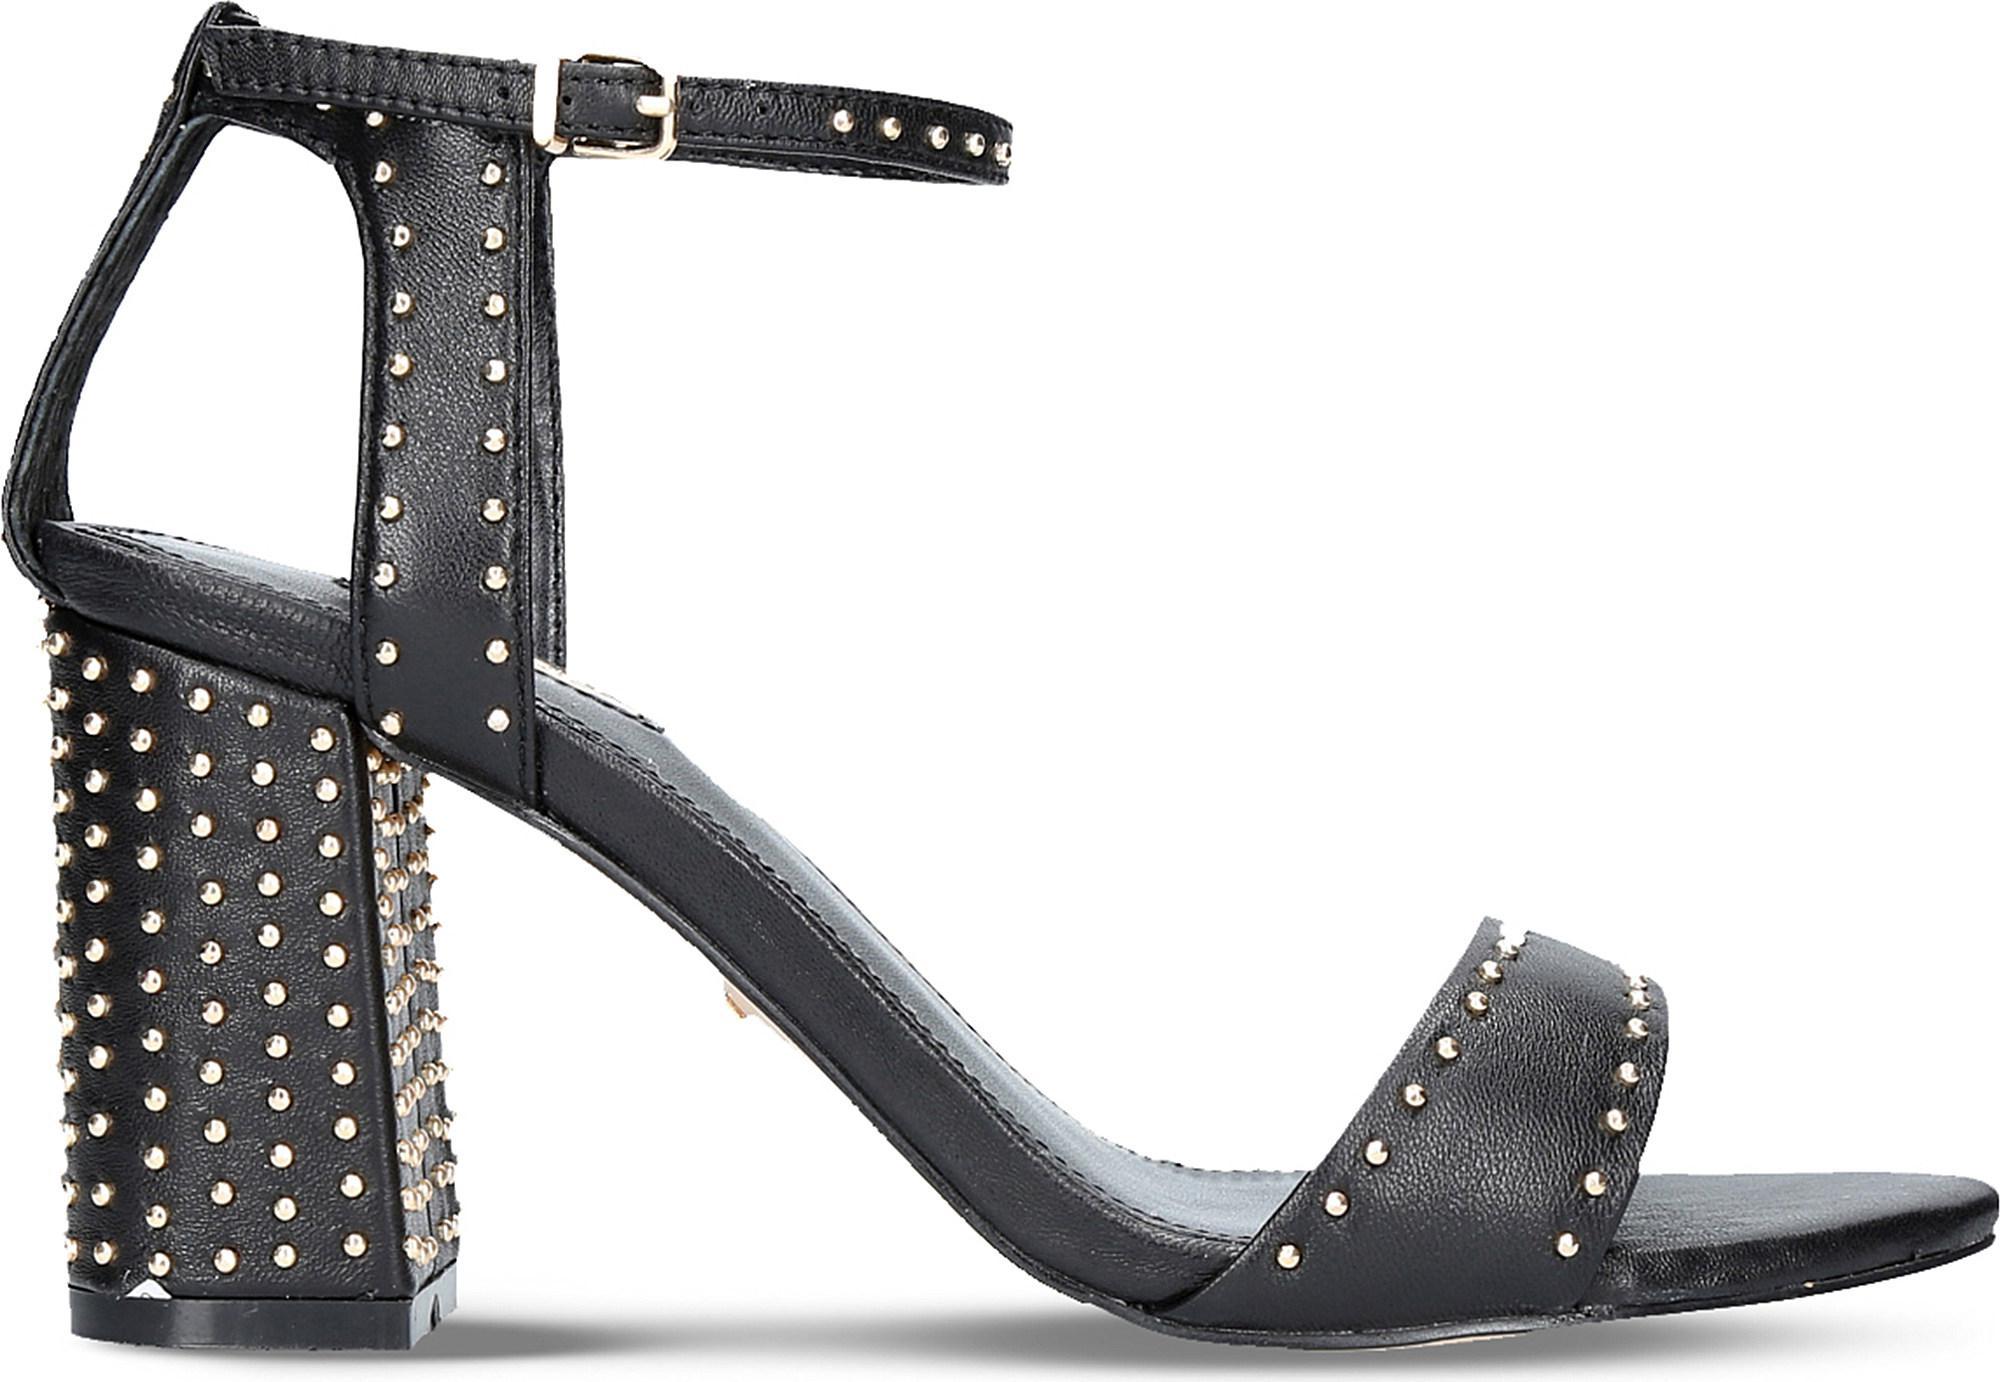 Carvela Kurt Geiger  Women's Black Gogo Leather Block Heel Sandals